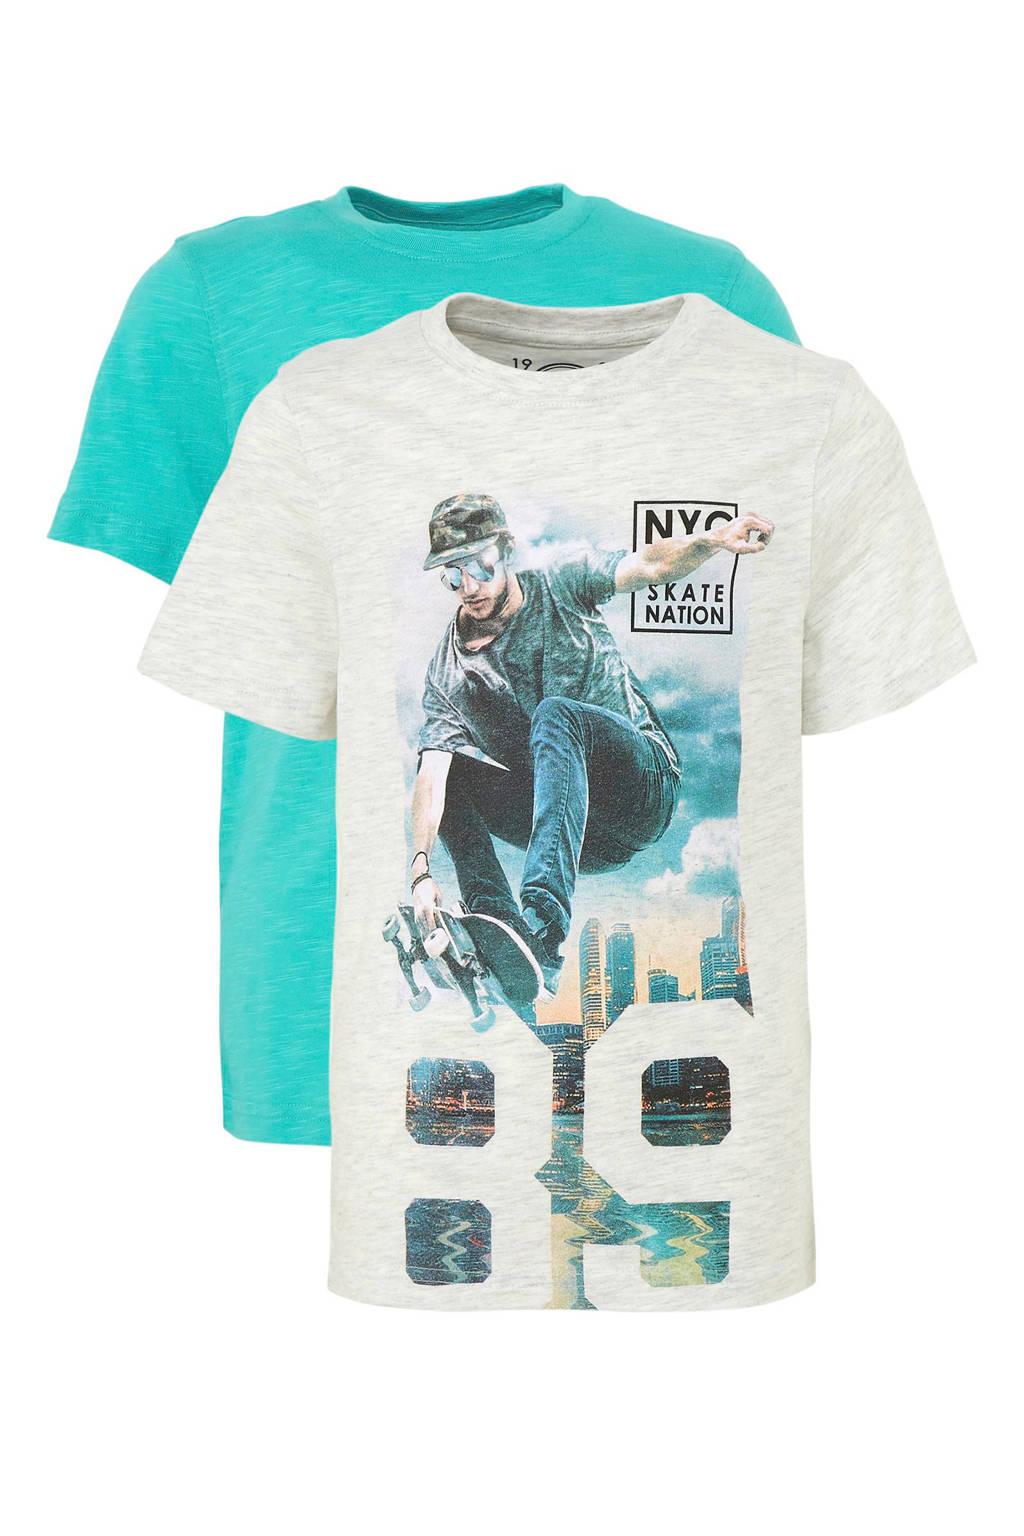 C&A Here & There T-shirt - set van 2, Lichtgrijs melange/ turquoise